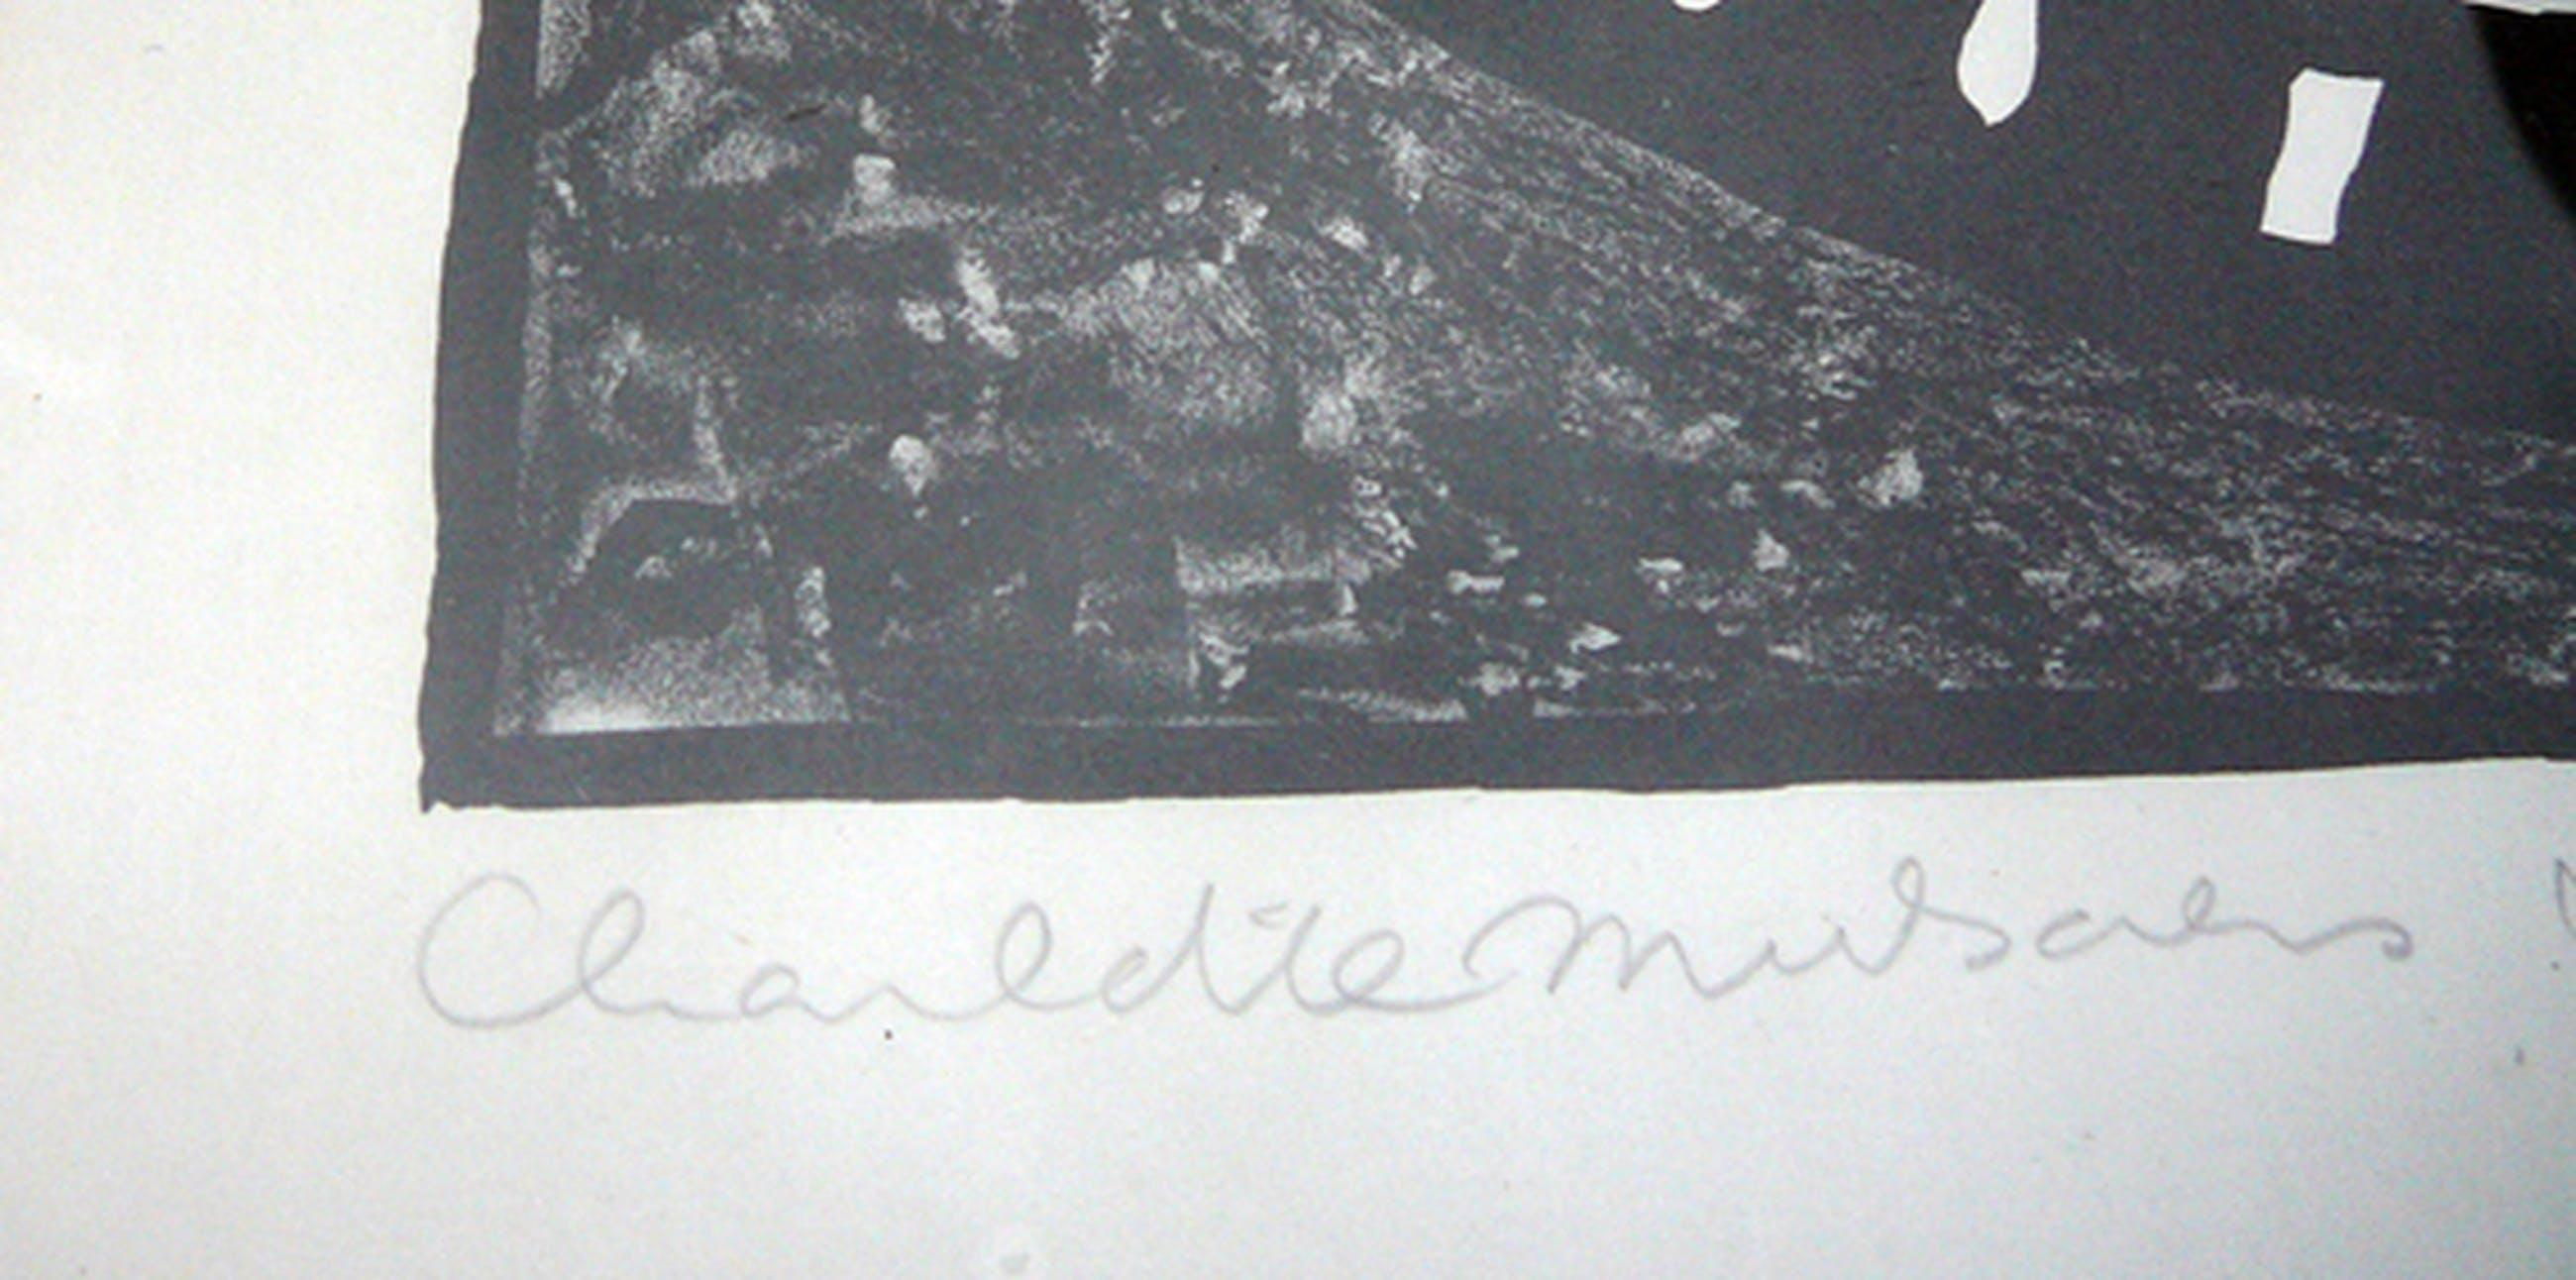 Charlotte Mutsaers: 'Piëta, 1984' -litho in lijst- kopen? Bied vanaf 60!